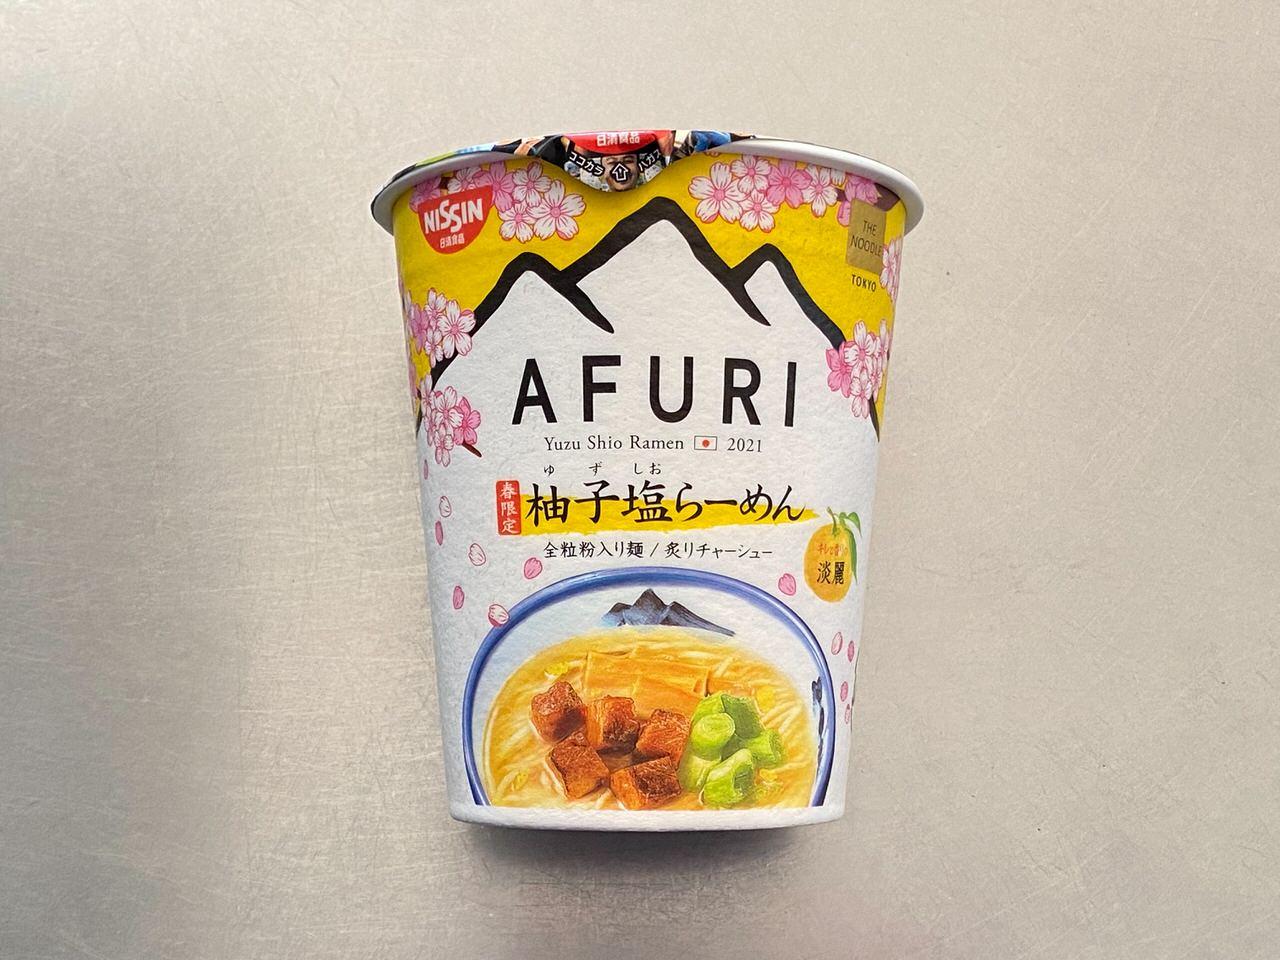 AFURI 春限定 柚子塩らーめん 淡麗(2021) 001 202103